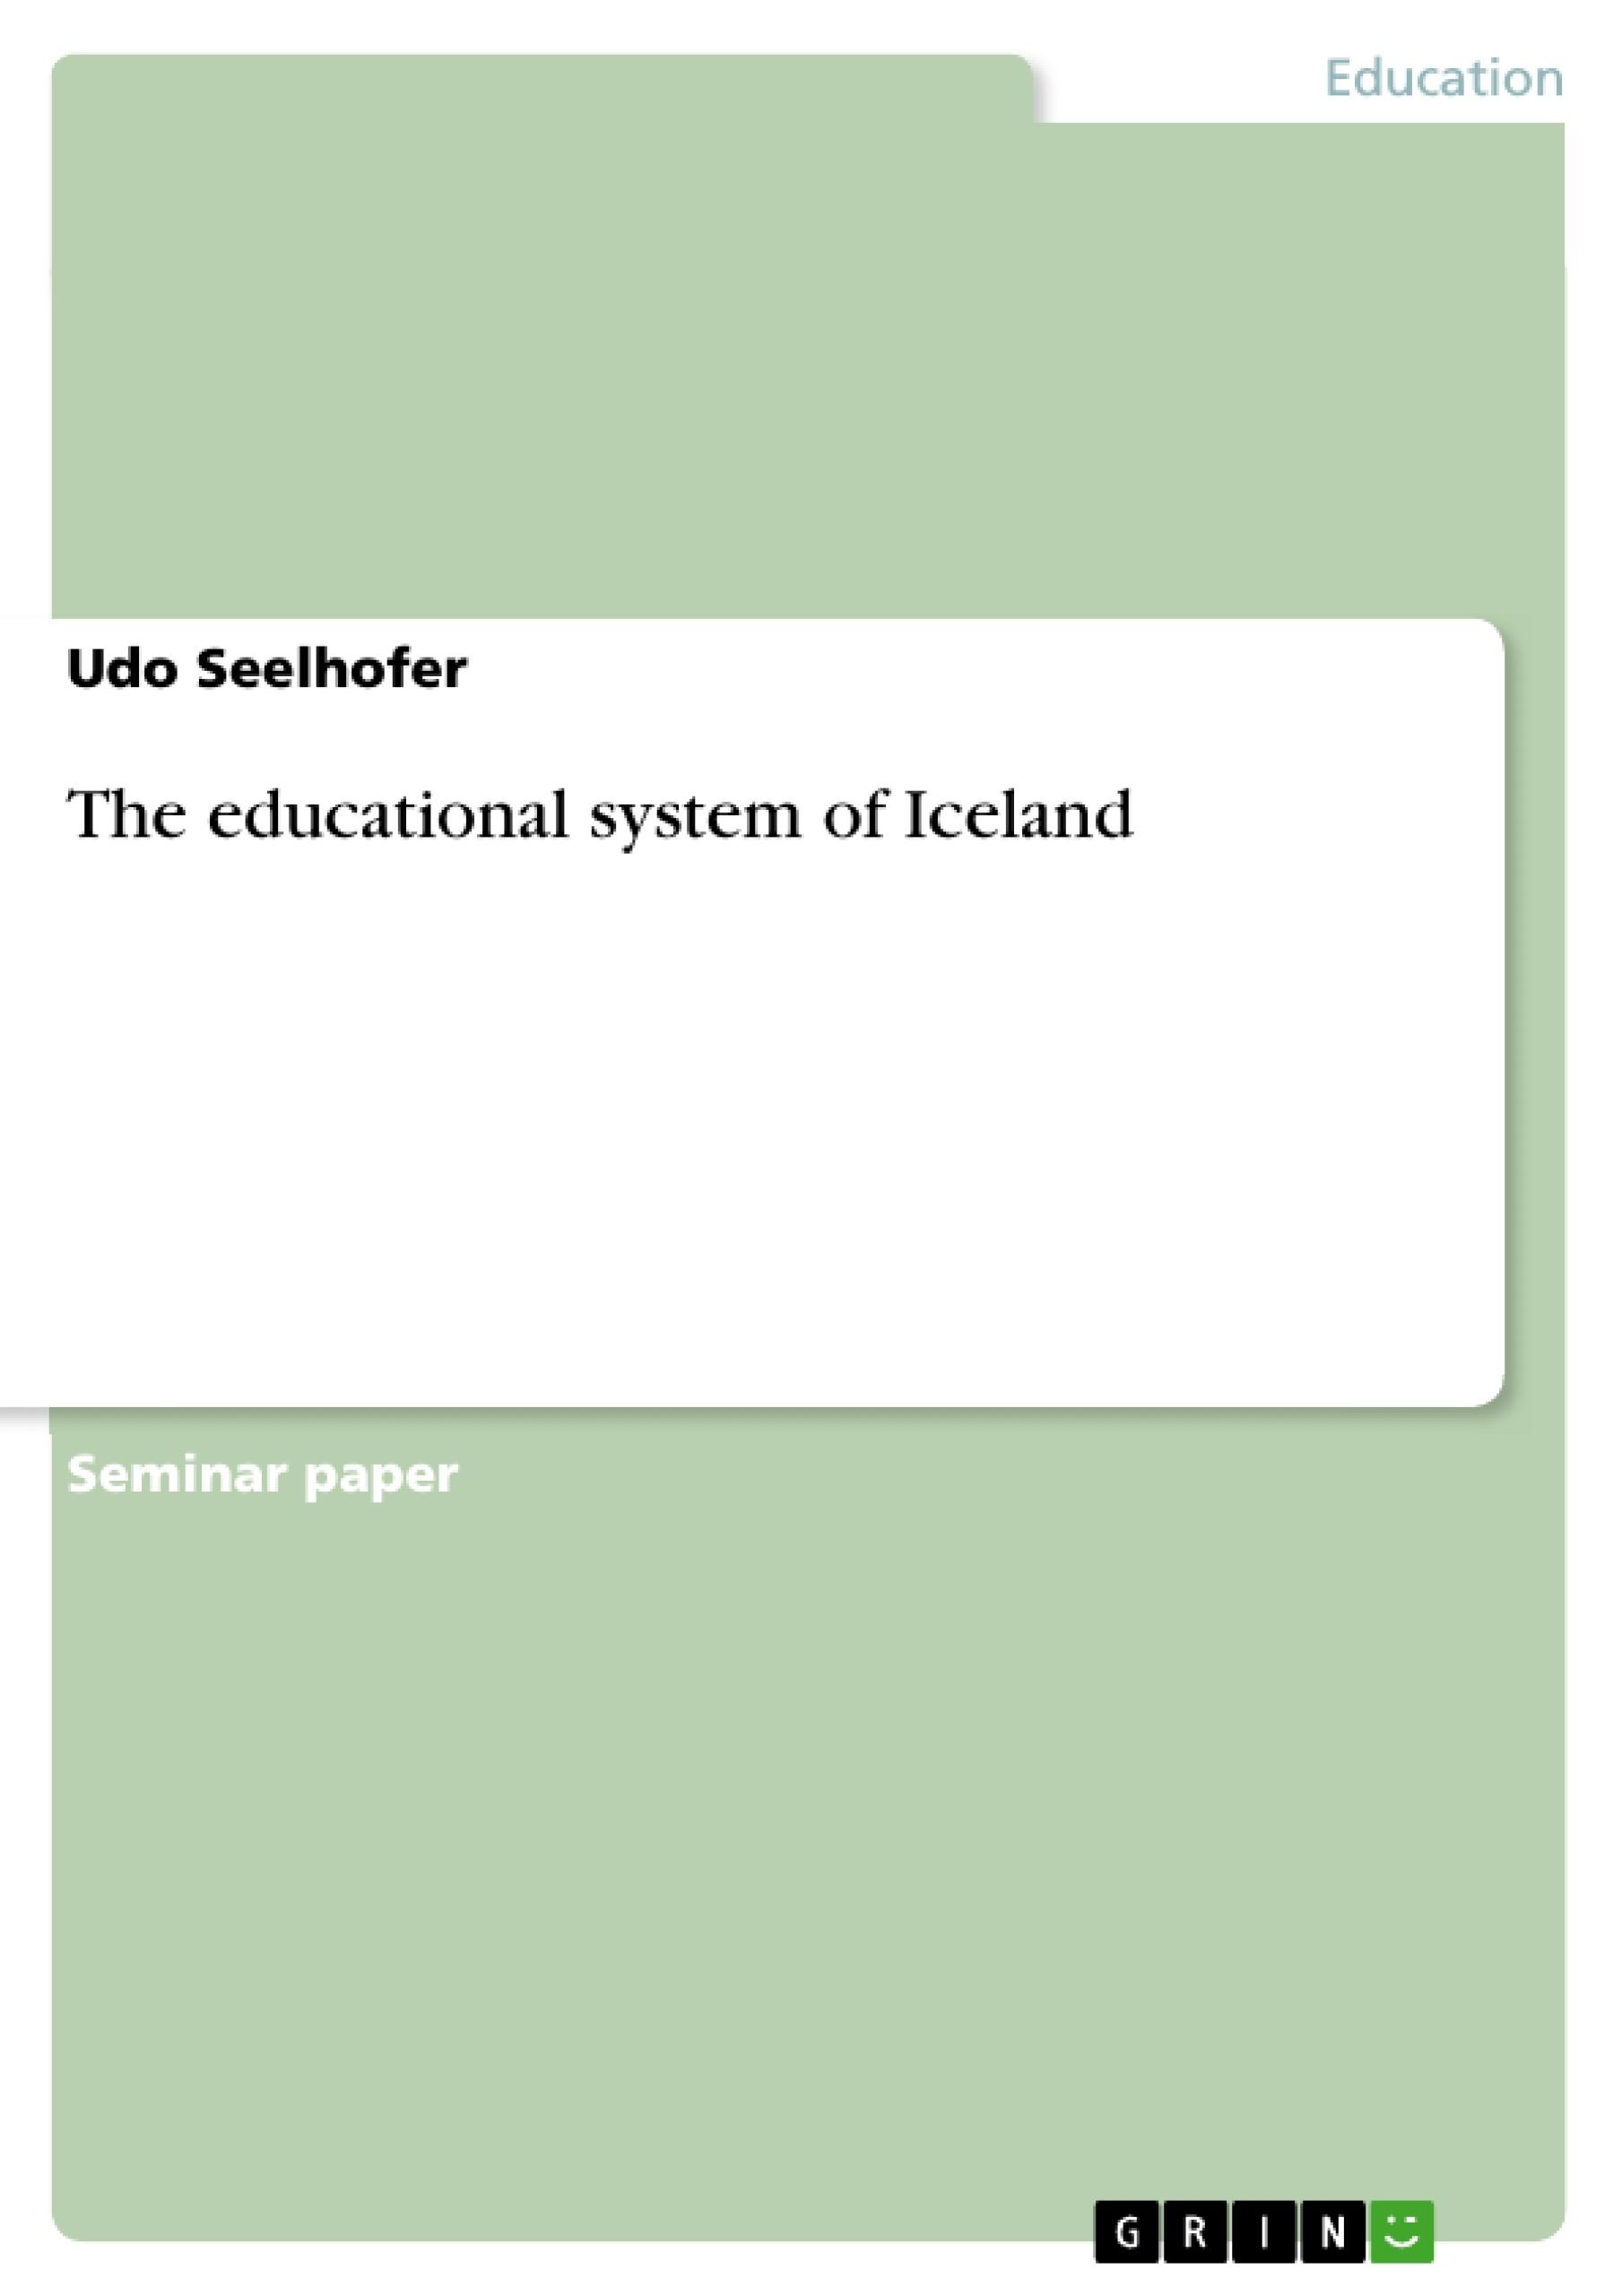 Ireland iceland comparison essay